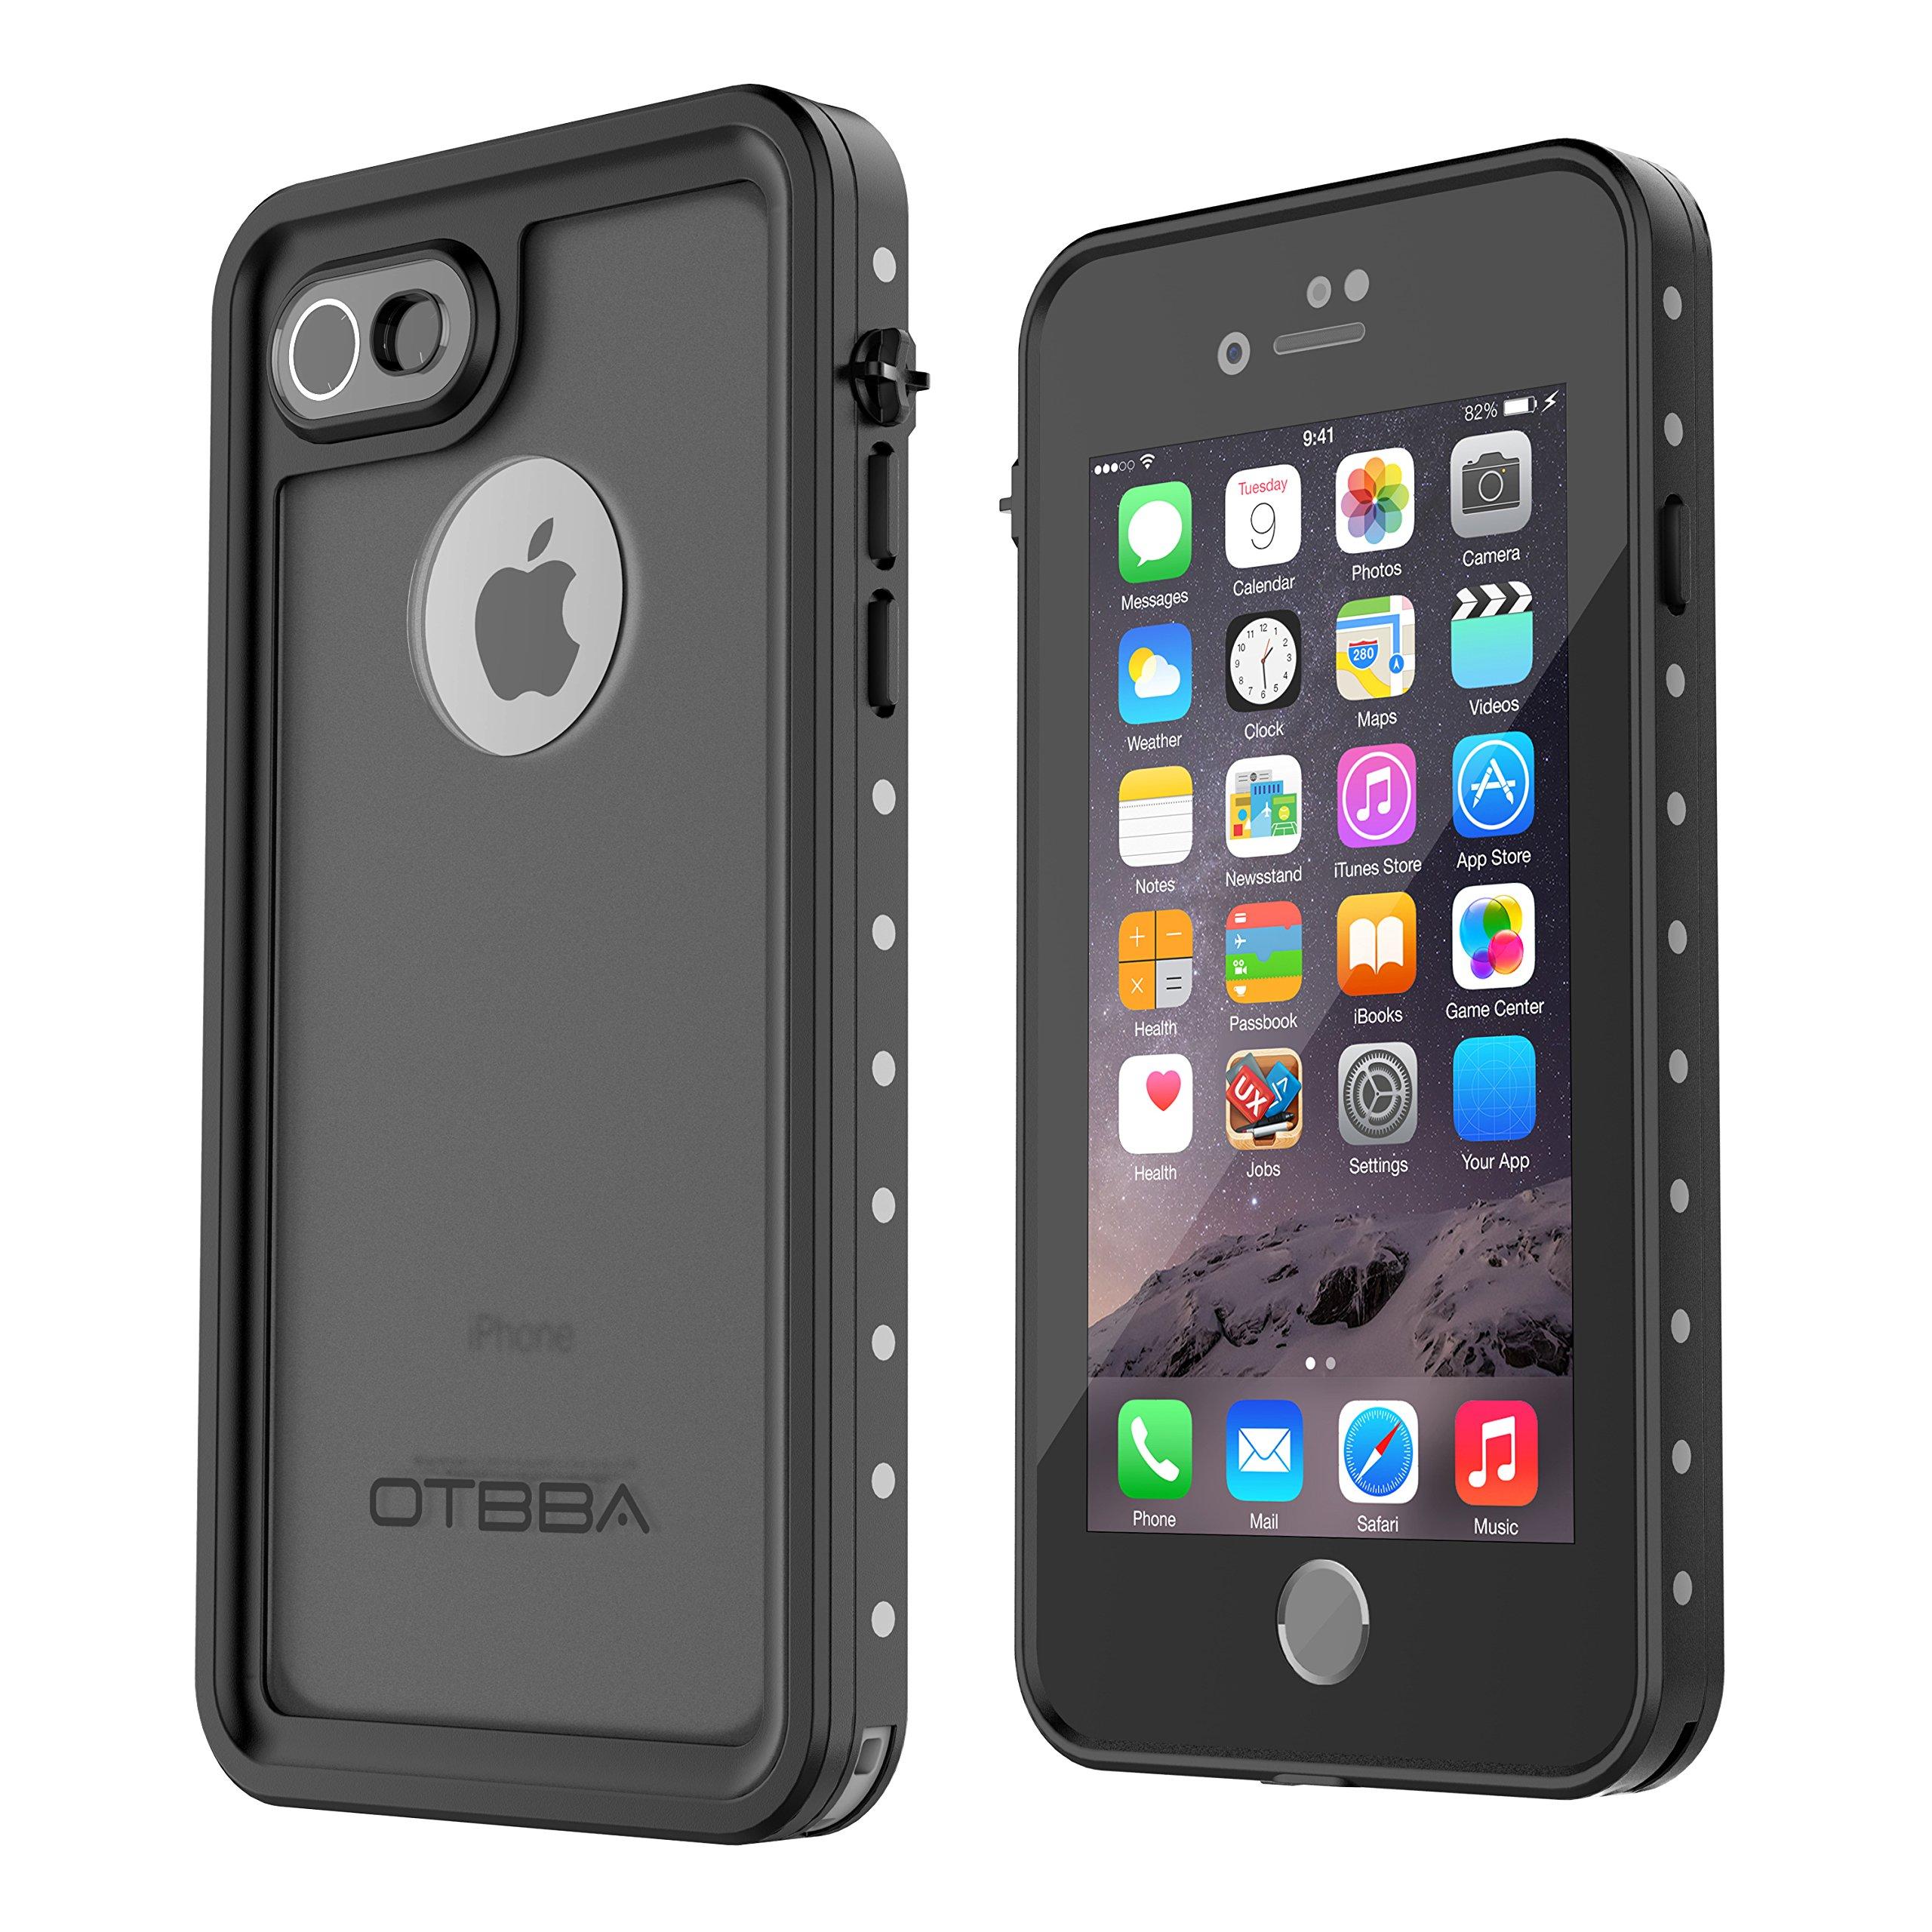 iPhone 7 Waterproof Case, OTBBA Underwater Cover Full Body Protective Shockproof Snowproof Dirtproof IP68 Certified Waterproof Case for iPhone 7 (4.7inch)